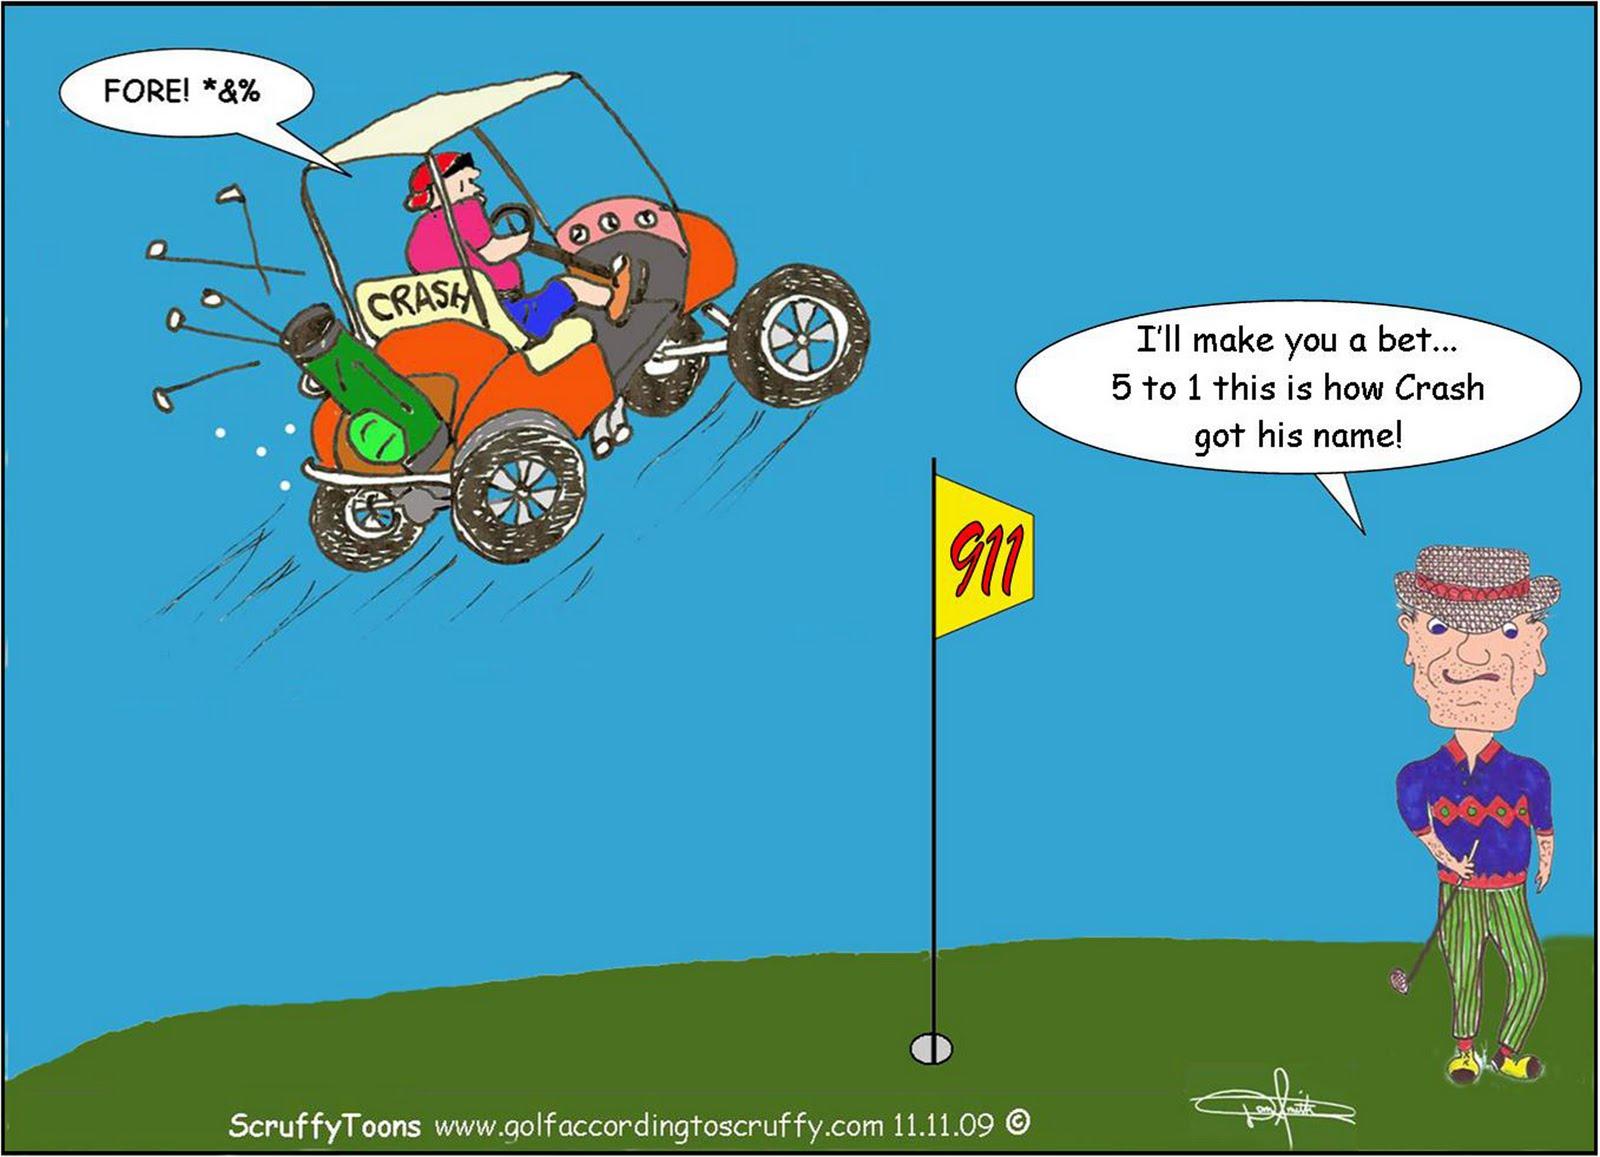 Scruffy S Word Crash Featured In Cartoon